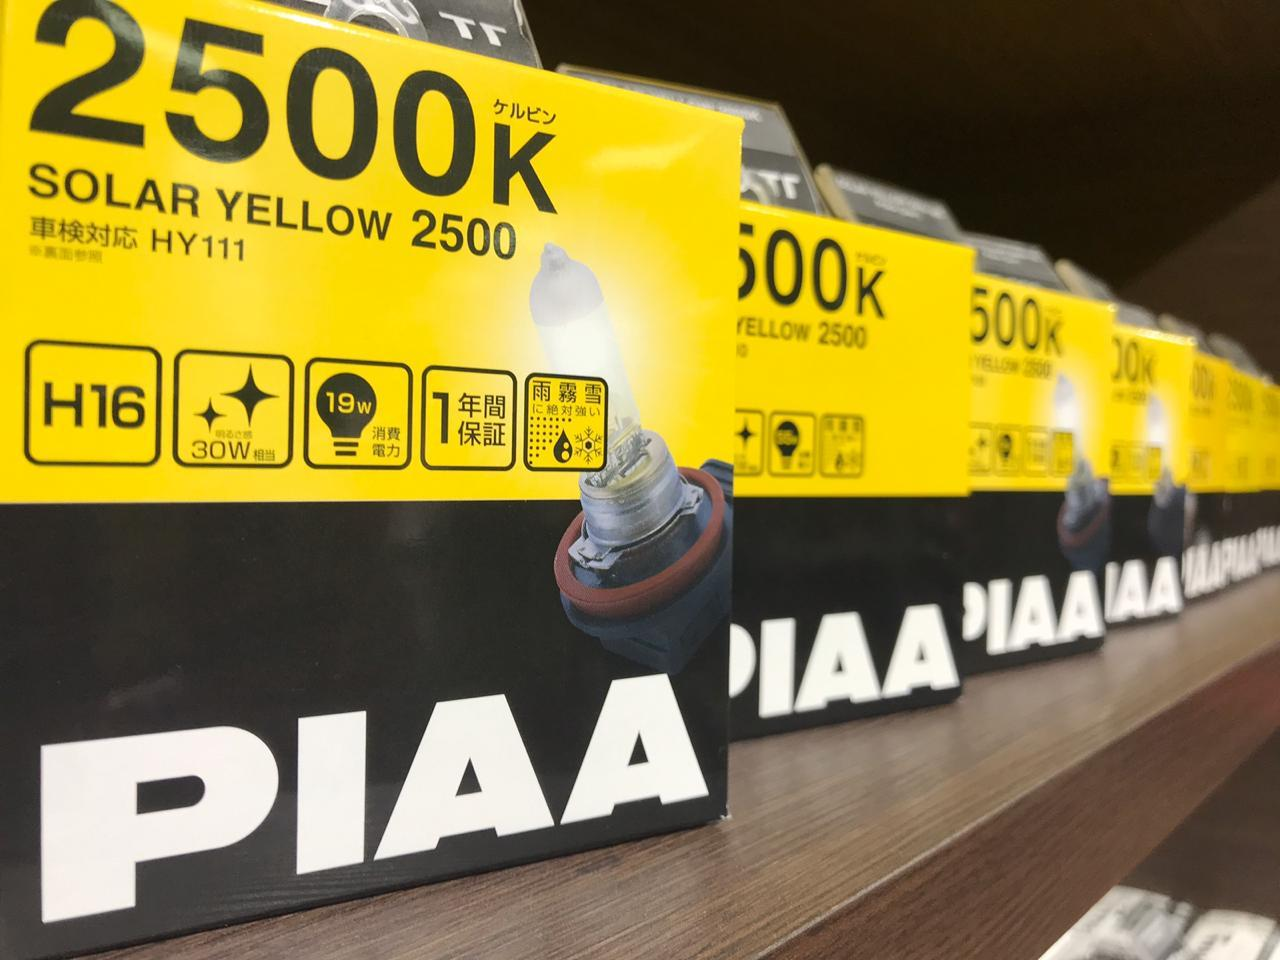 Галогенные лампы Piaa Solar Yellow H-4